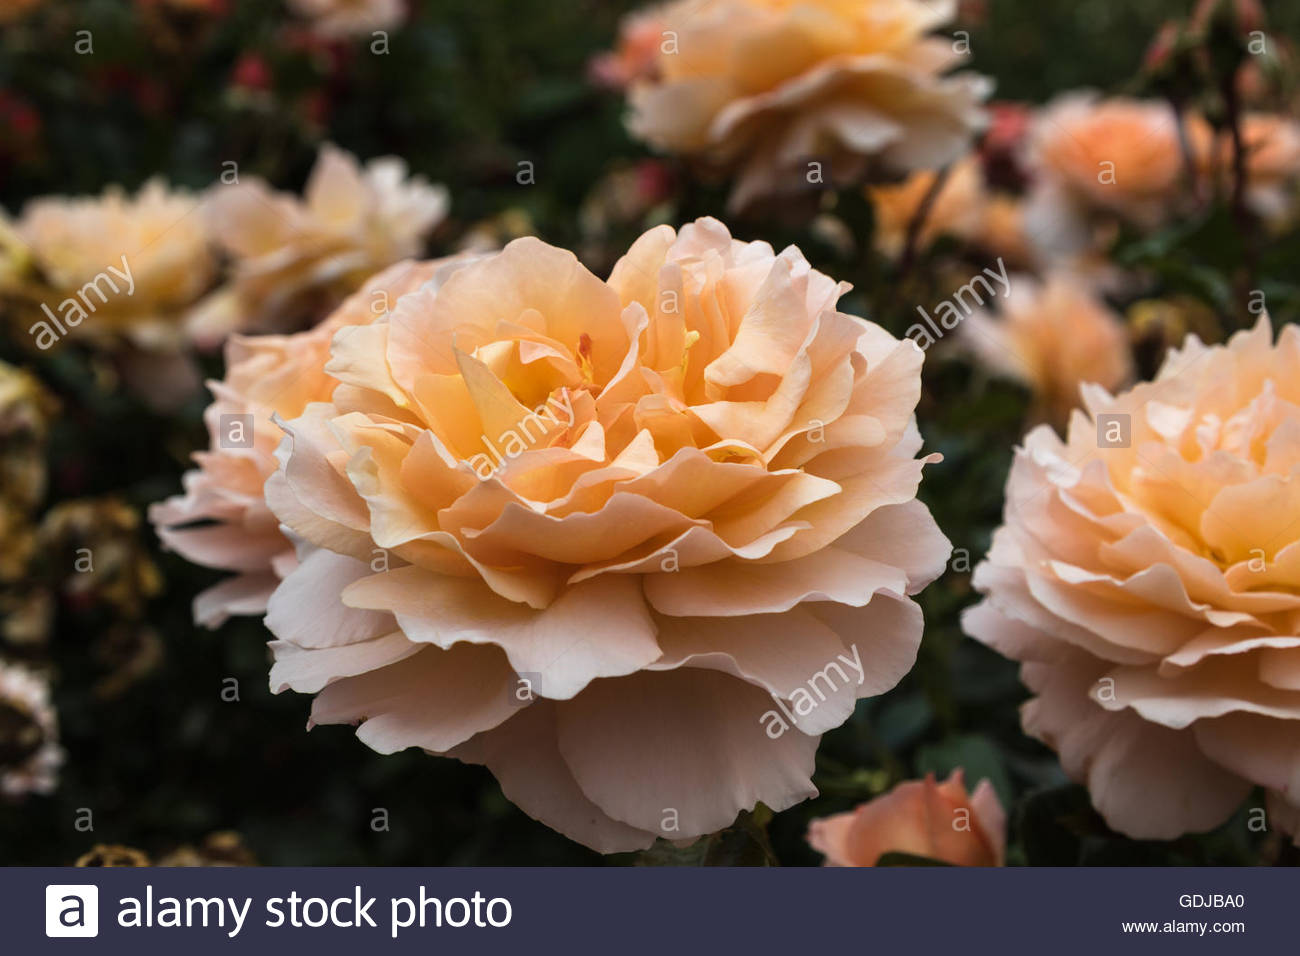 Floribunda rose blossom var. Great Expectations - Stock Image